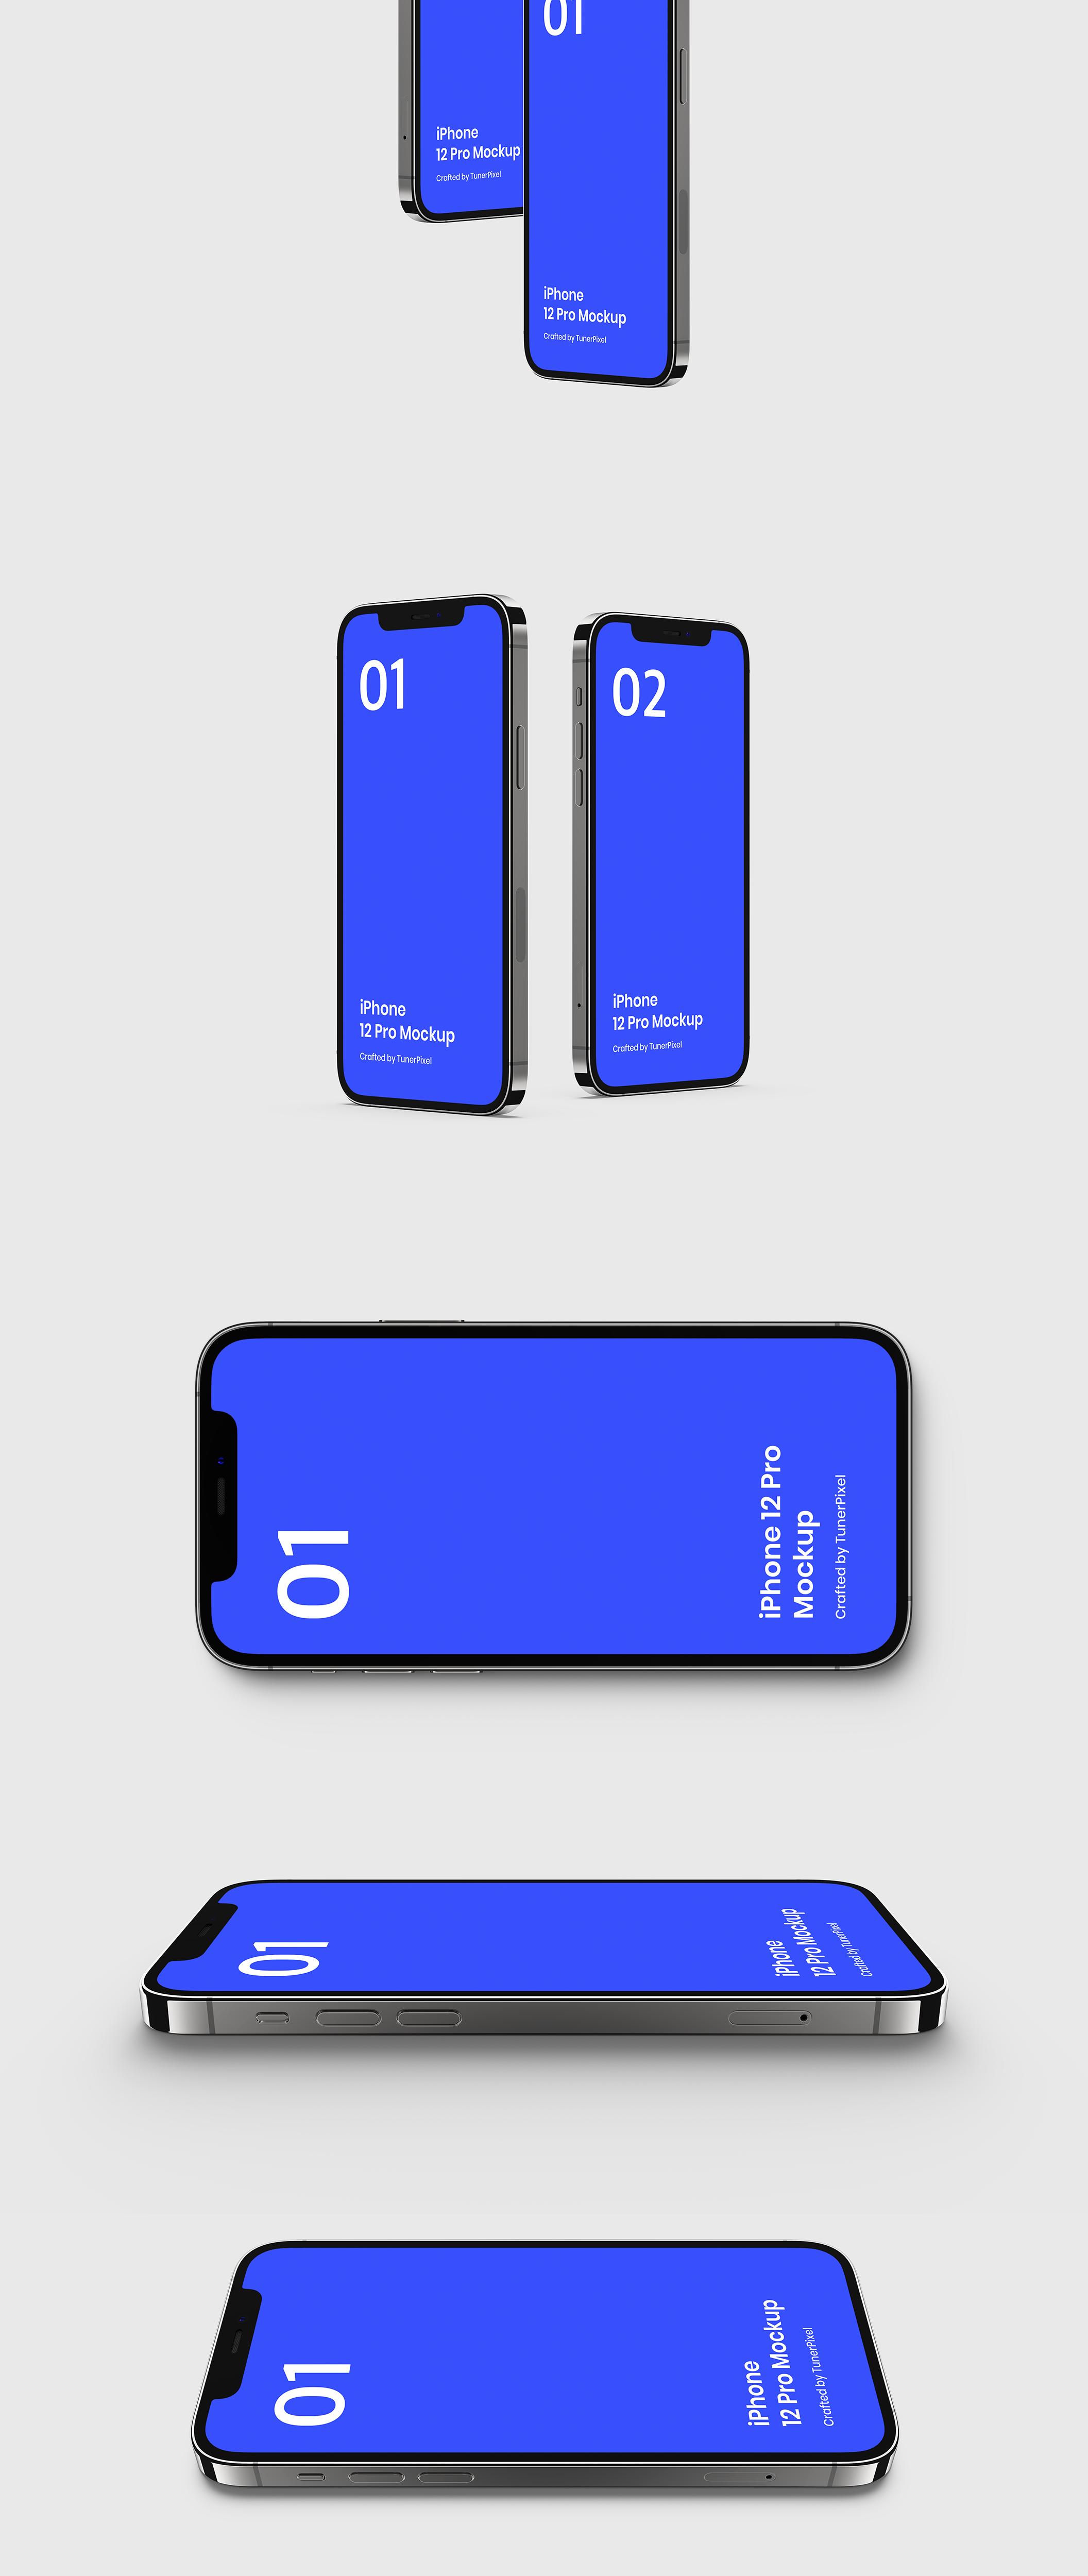 20款应用程序APP设计苹果手机iPhone 12 Pro屏幕演示样机模板 iPhone 12 Pro Mockup – 20 Exclusive Mockups Scenes插图2